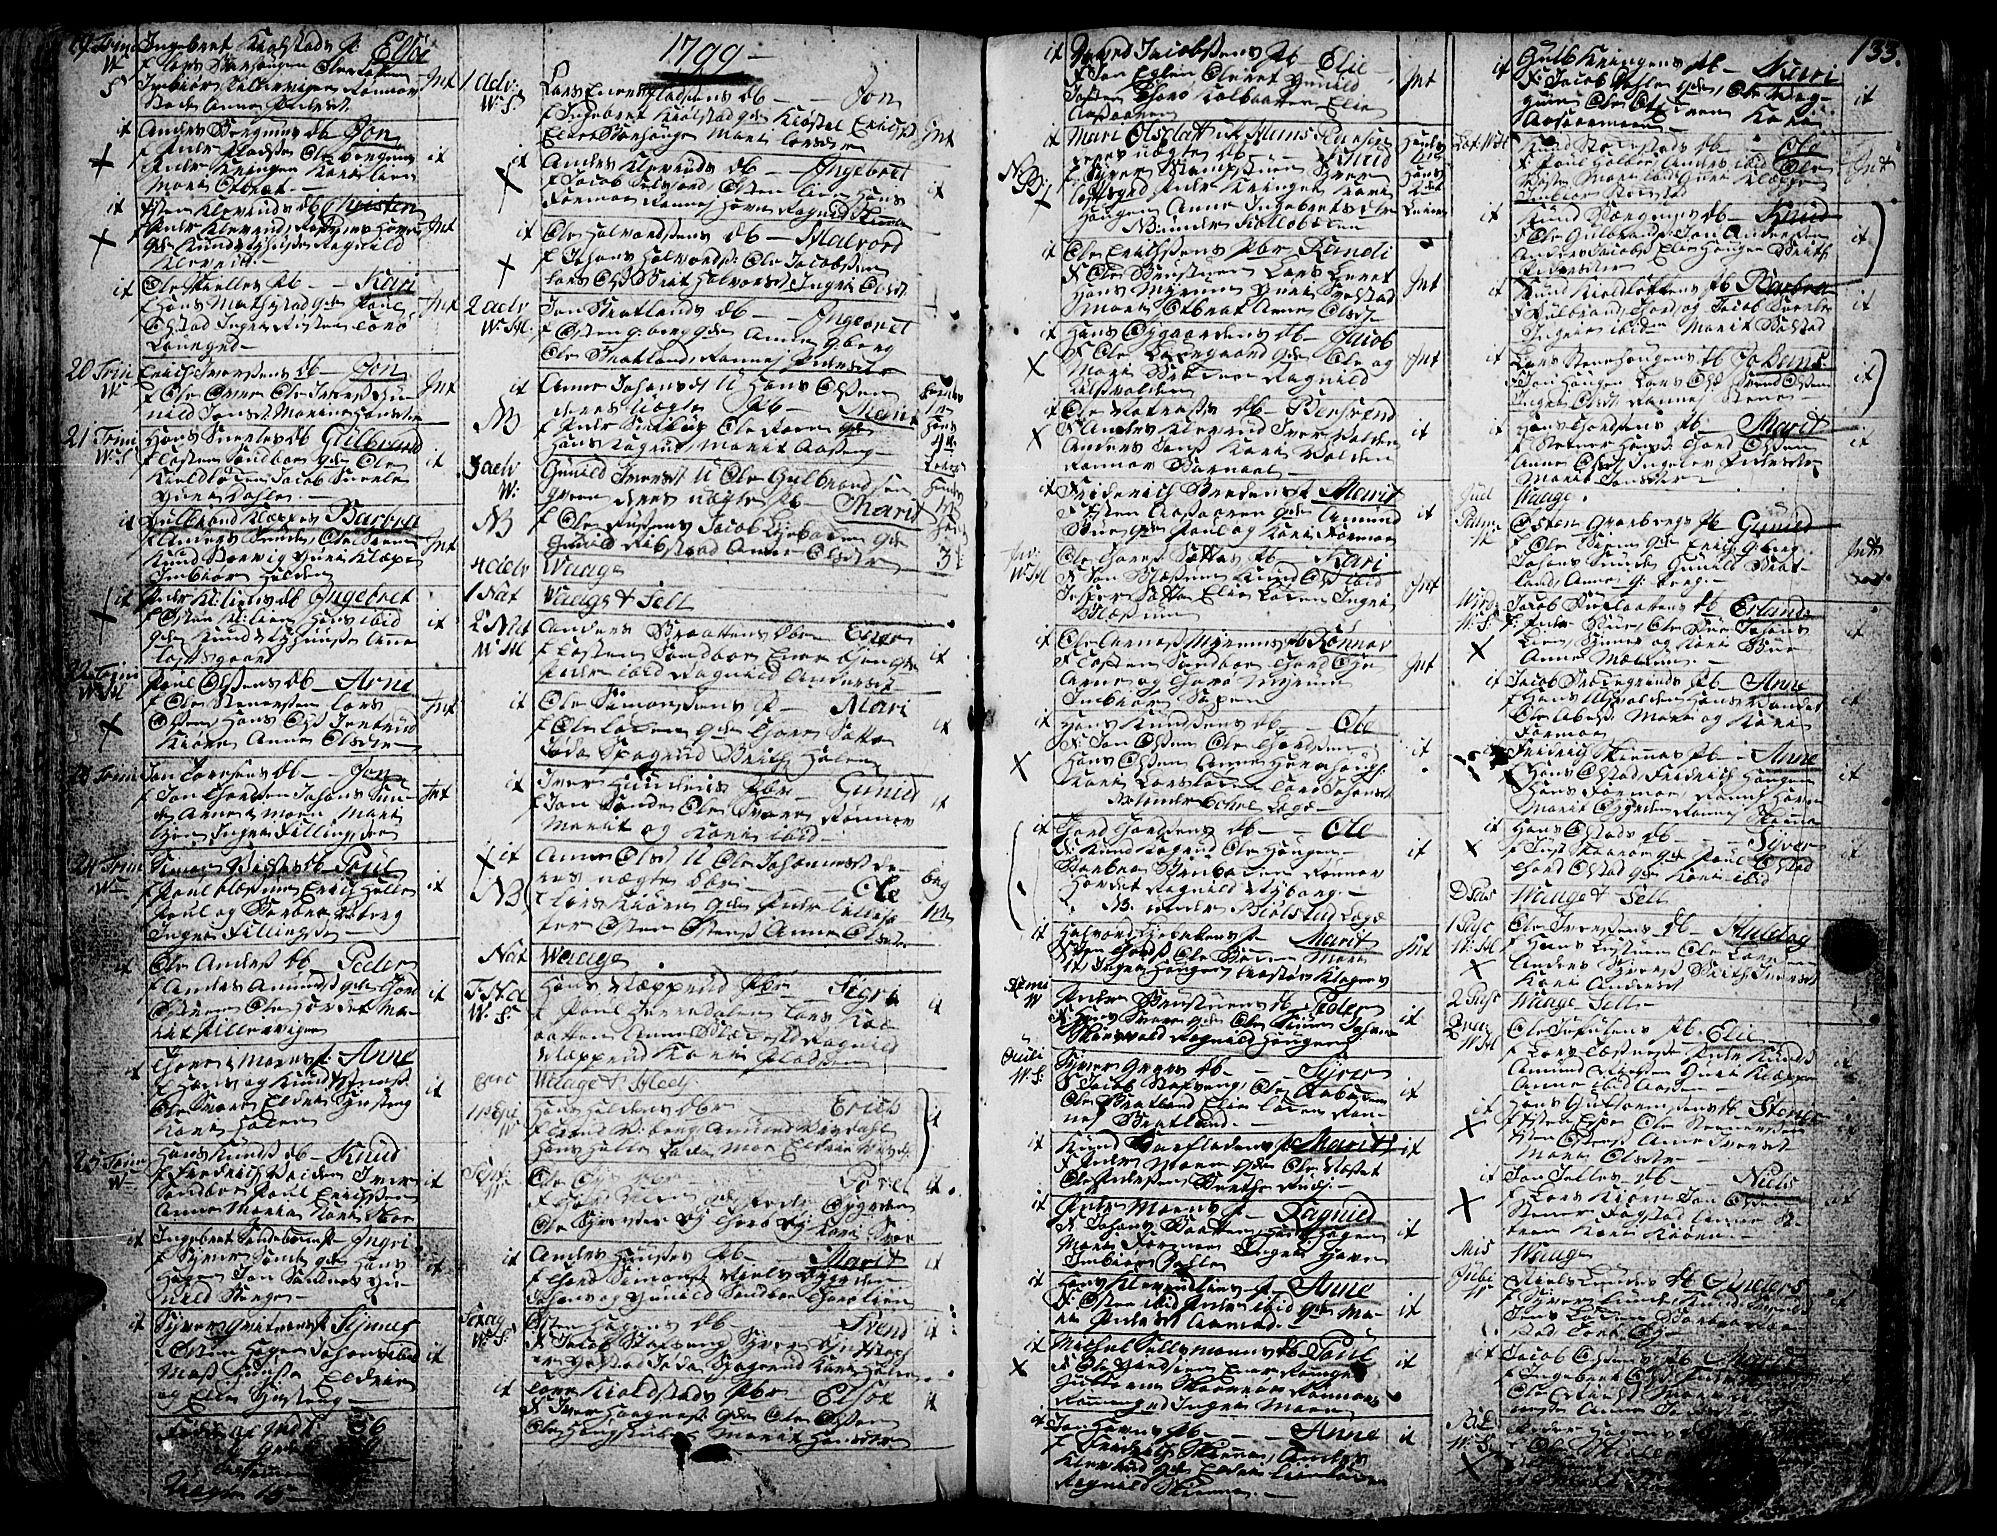 SAH, Vågå prestekontor, Ministerialbok nr. 1, 1739-1810, s. 133